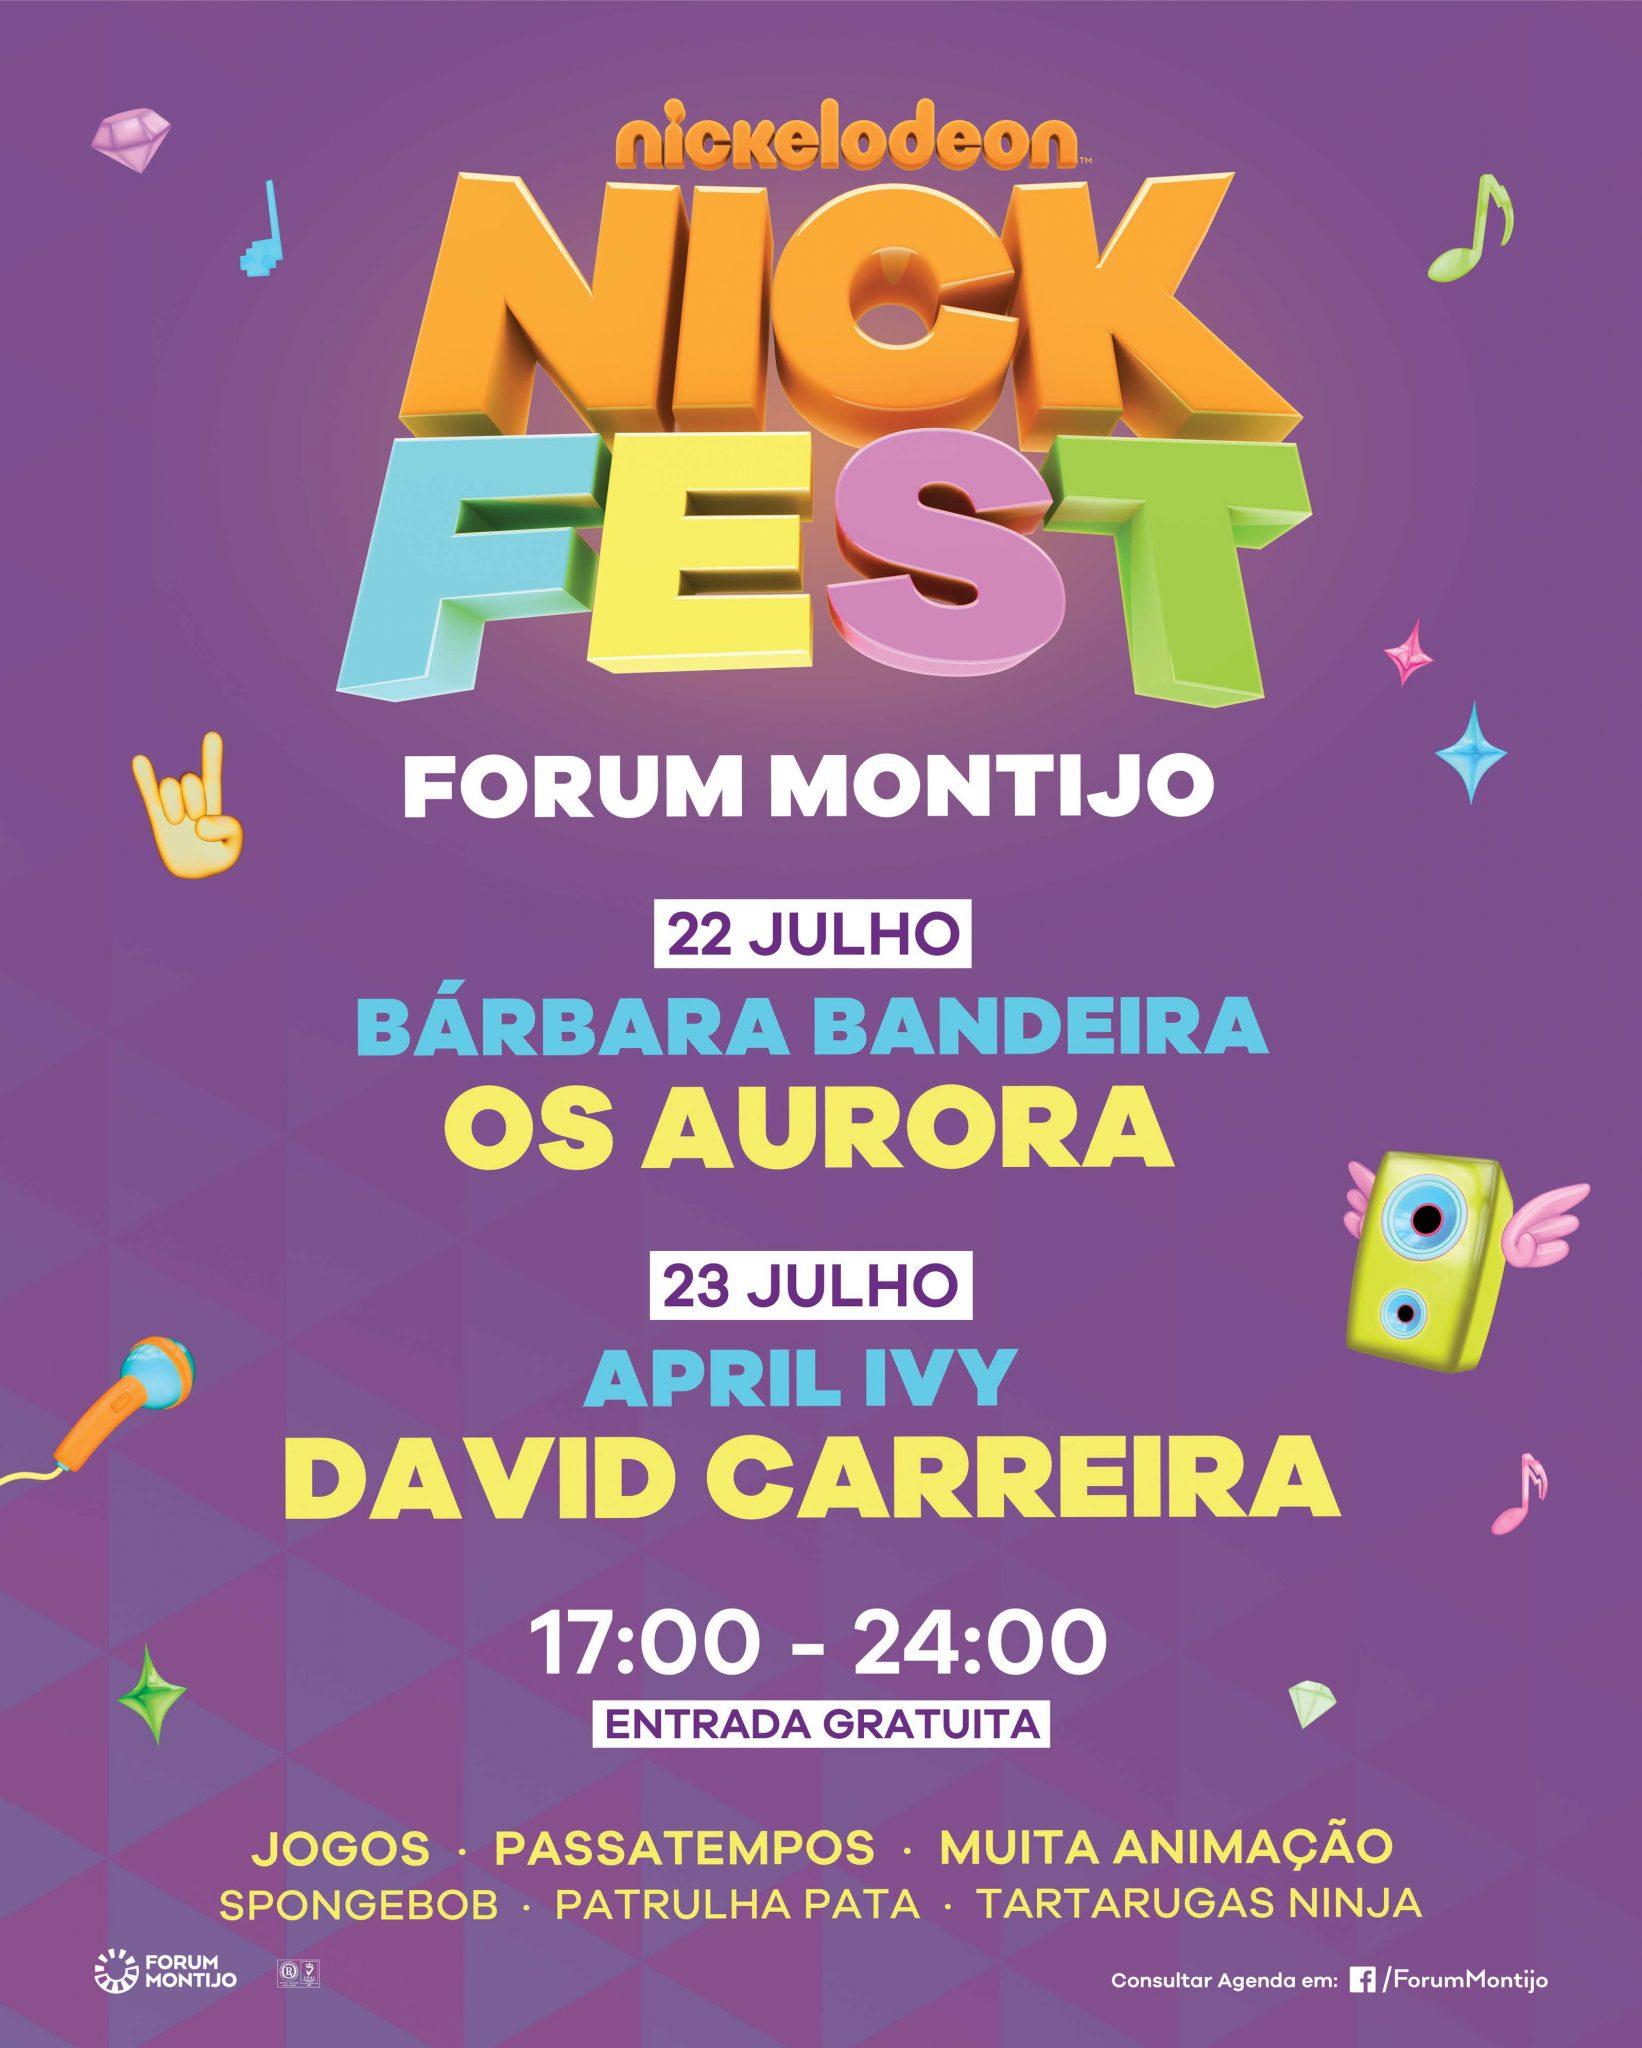 Nick Fest | 1º Festival Teen do país no Forum Montijo